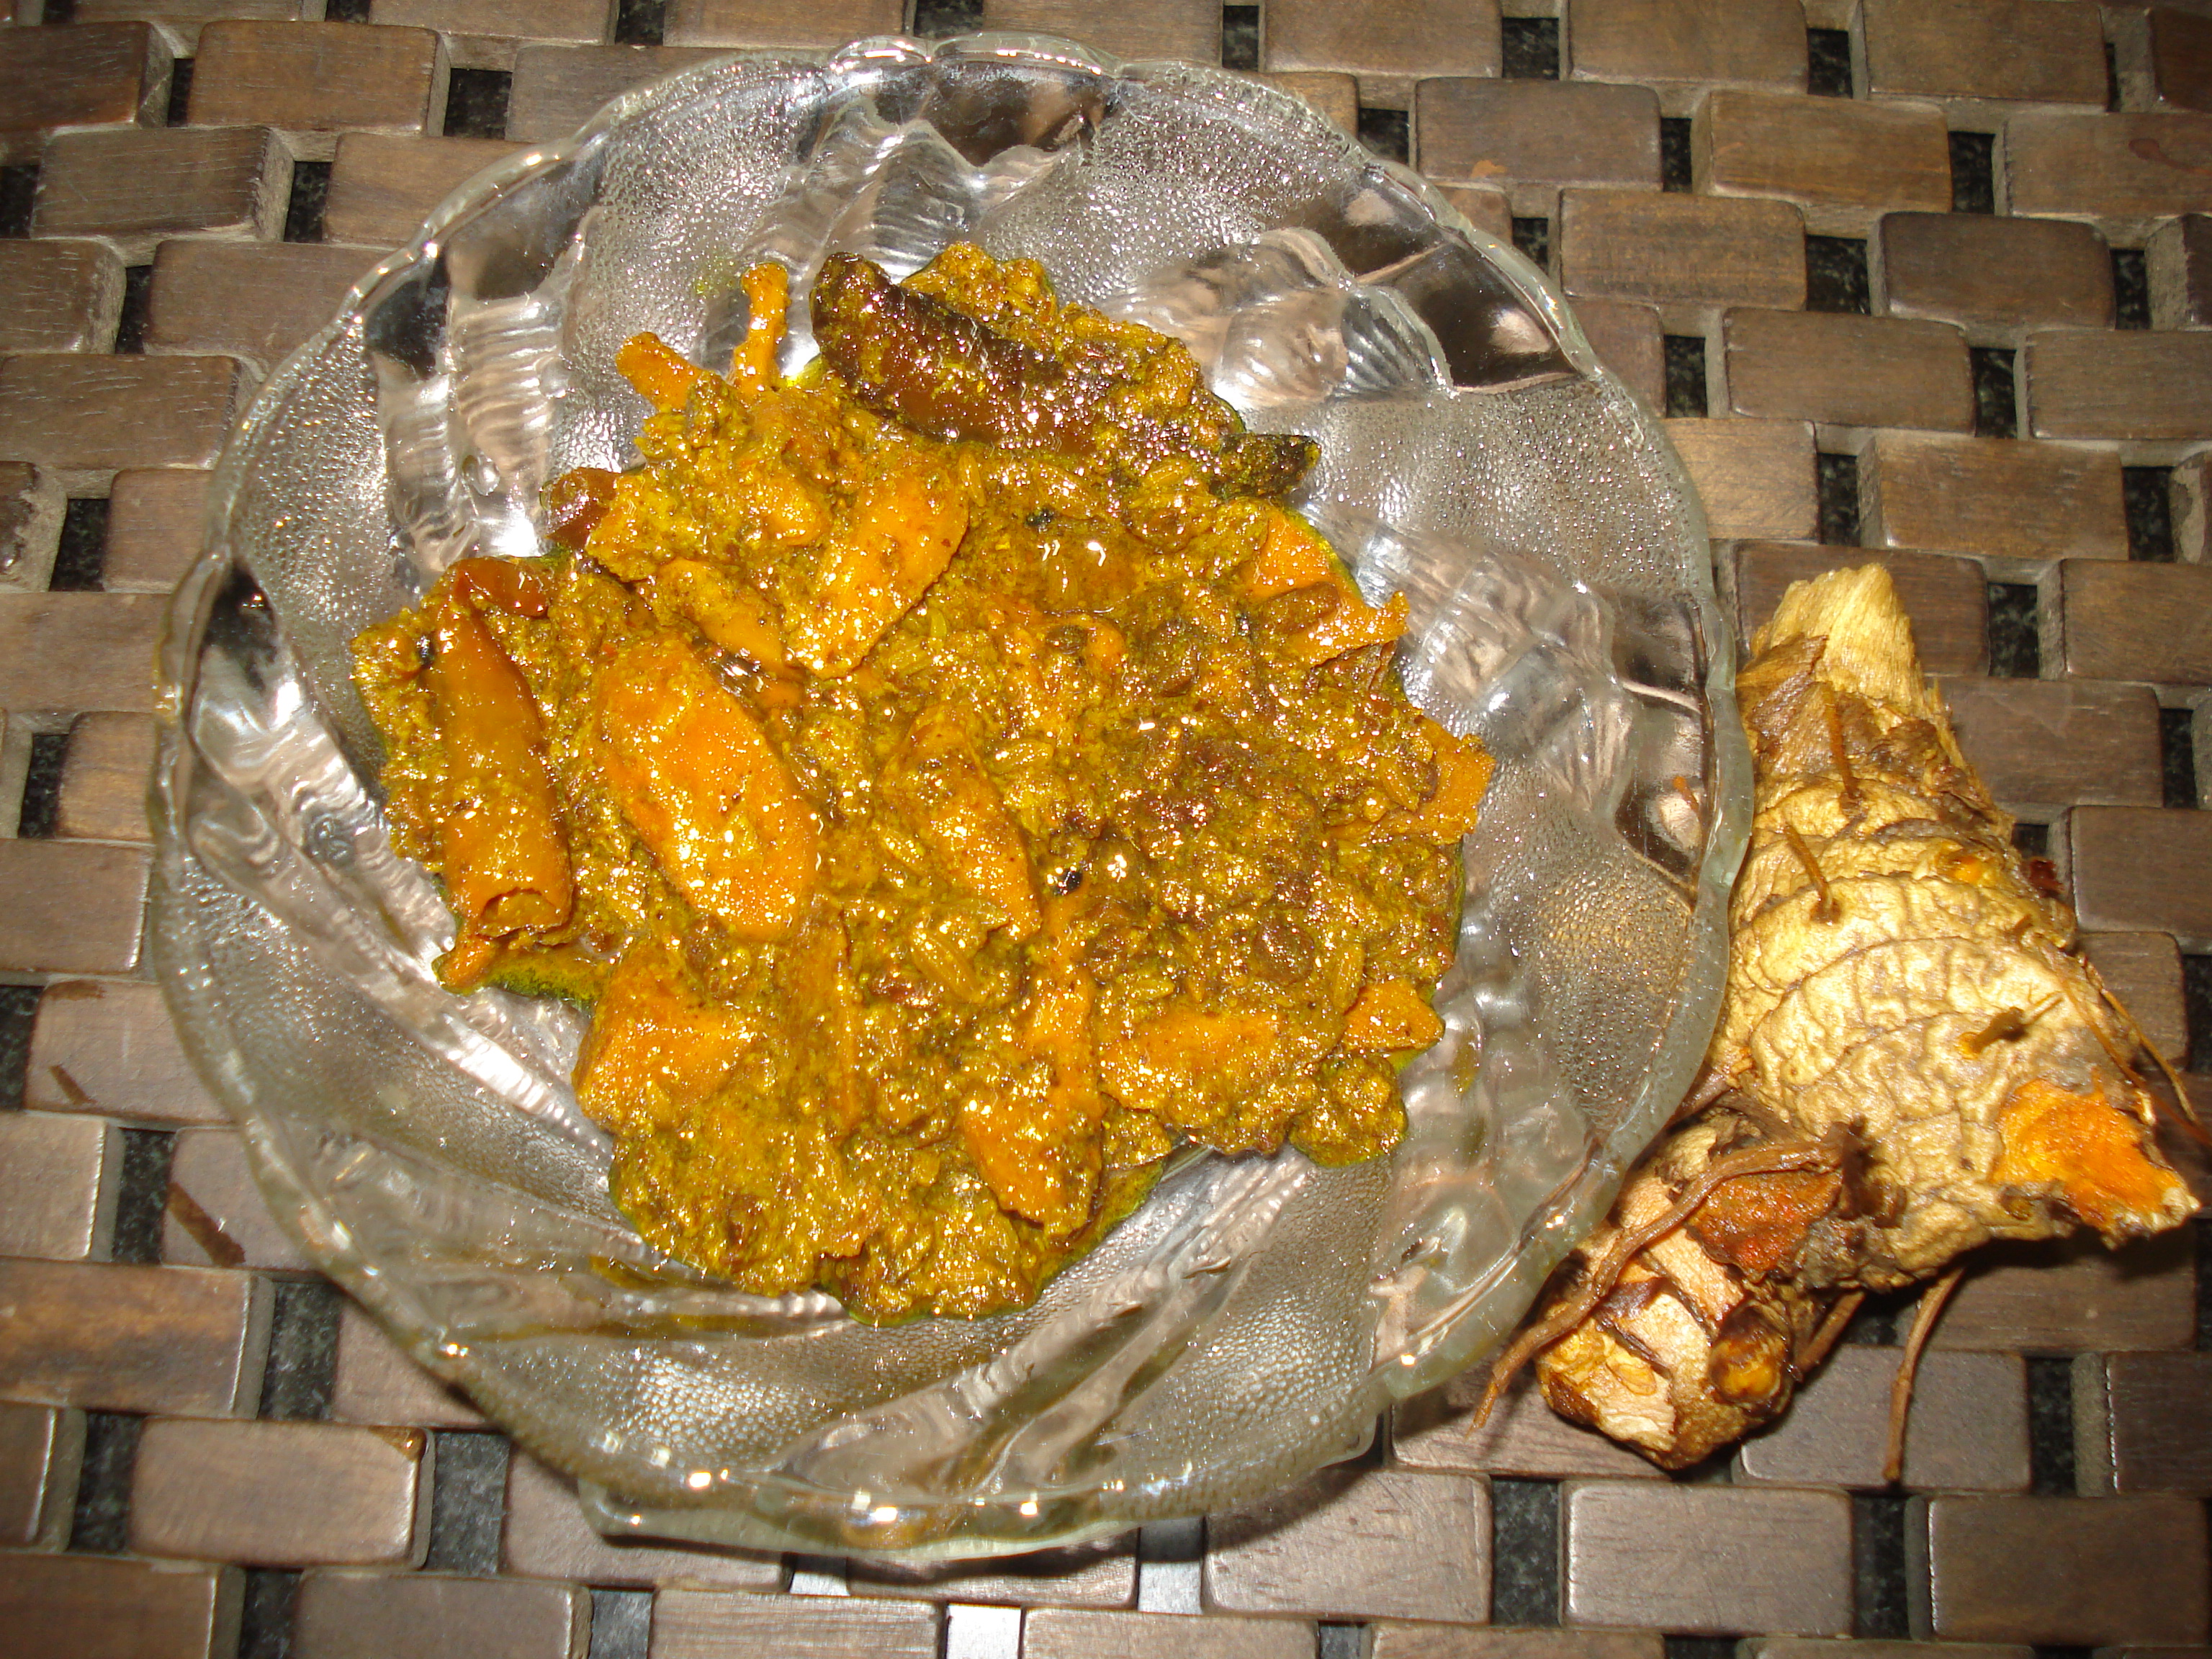 Kachhi Haldi ka Acha(Raw turmeric pickle)(Useful and medicinal haldi pickle)